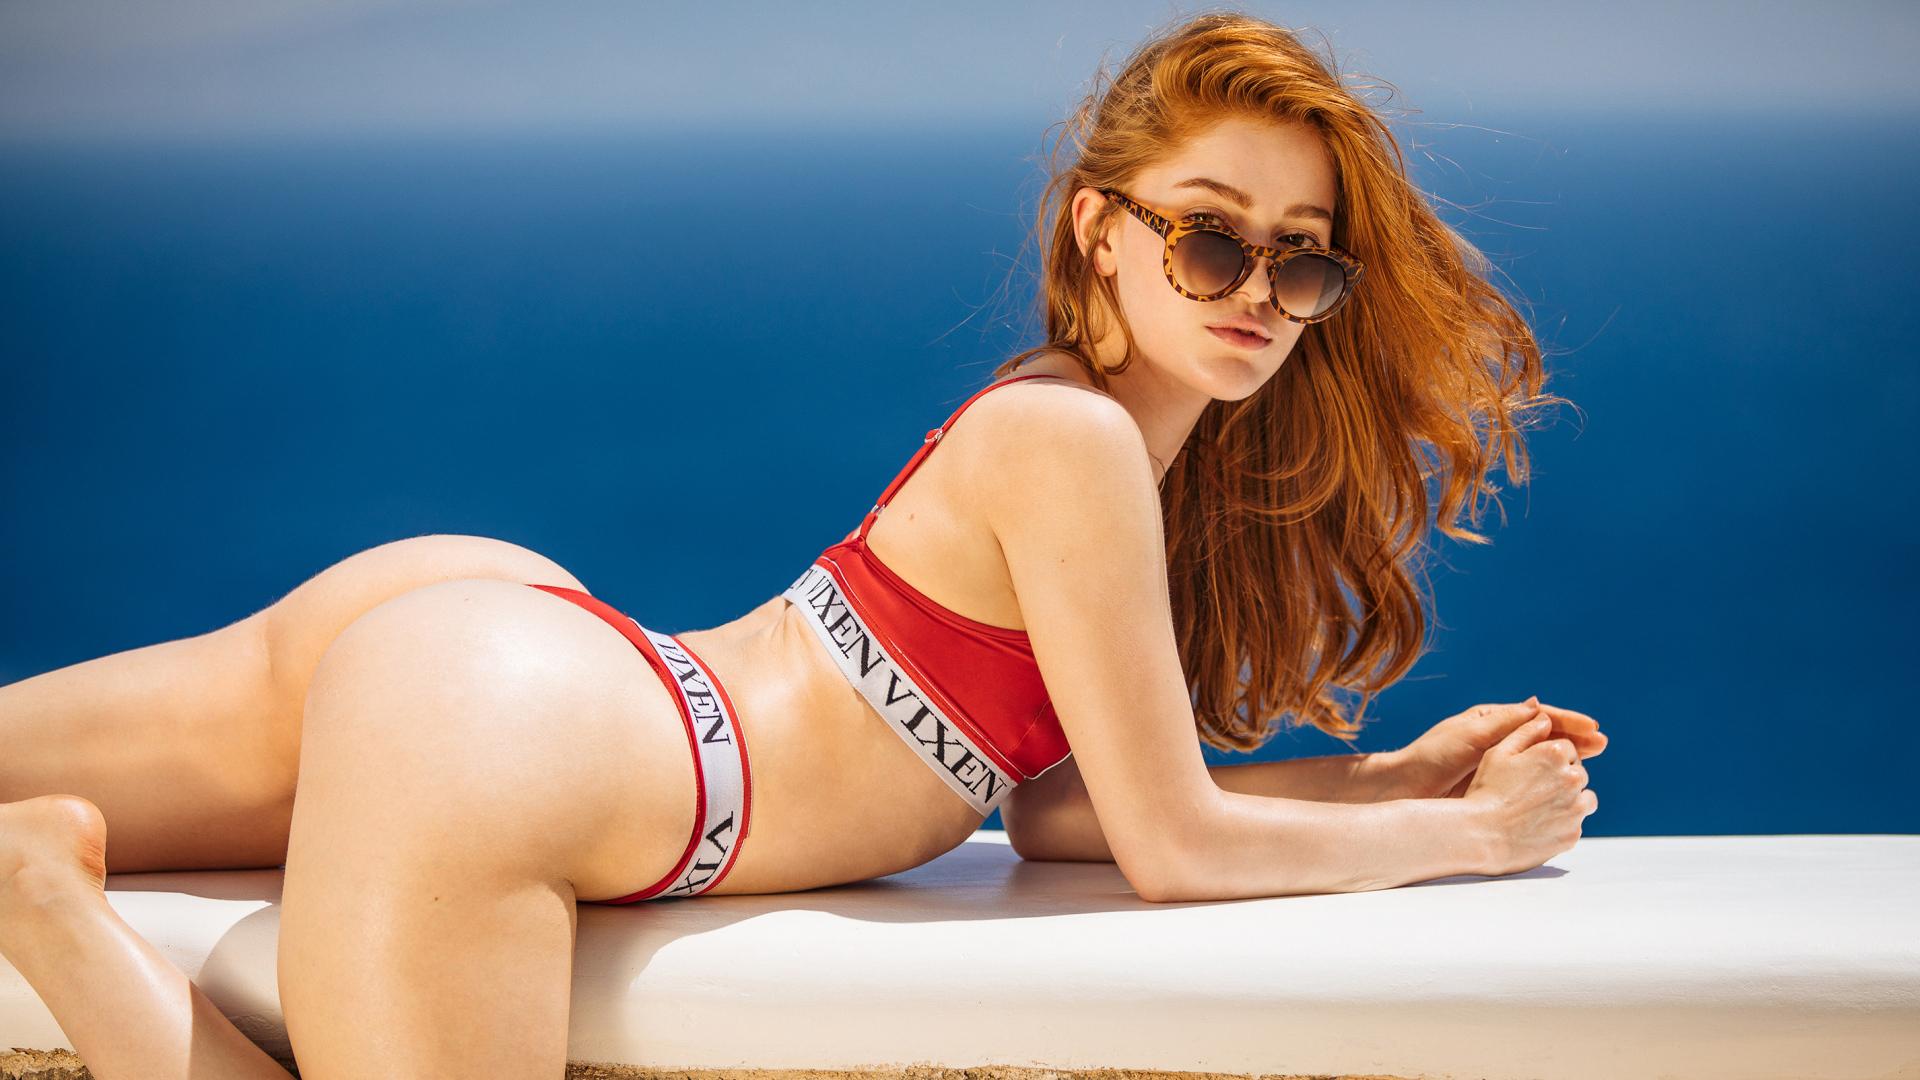 Порноактрисы России - Jia Lissa